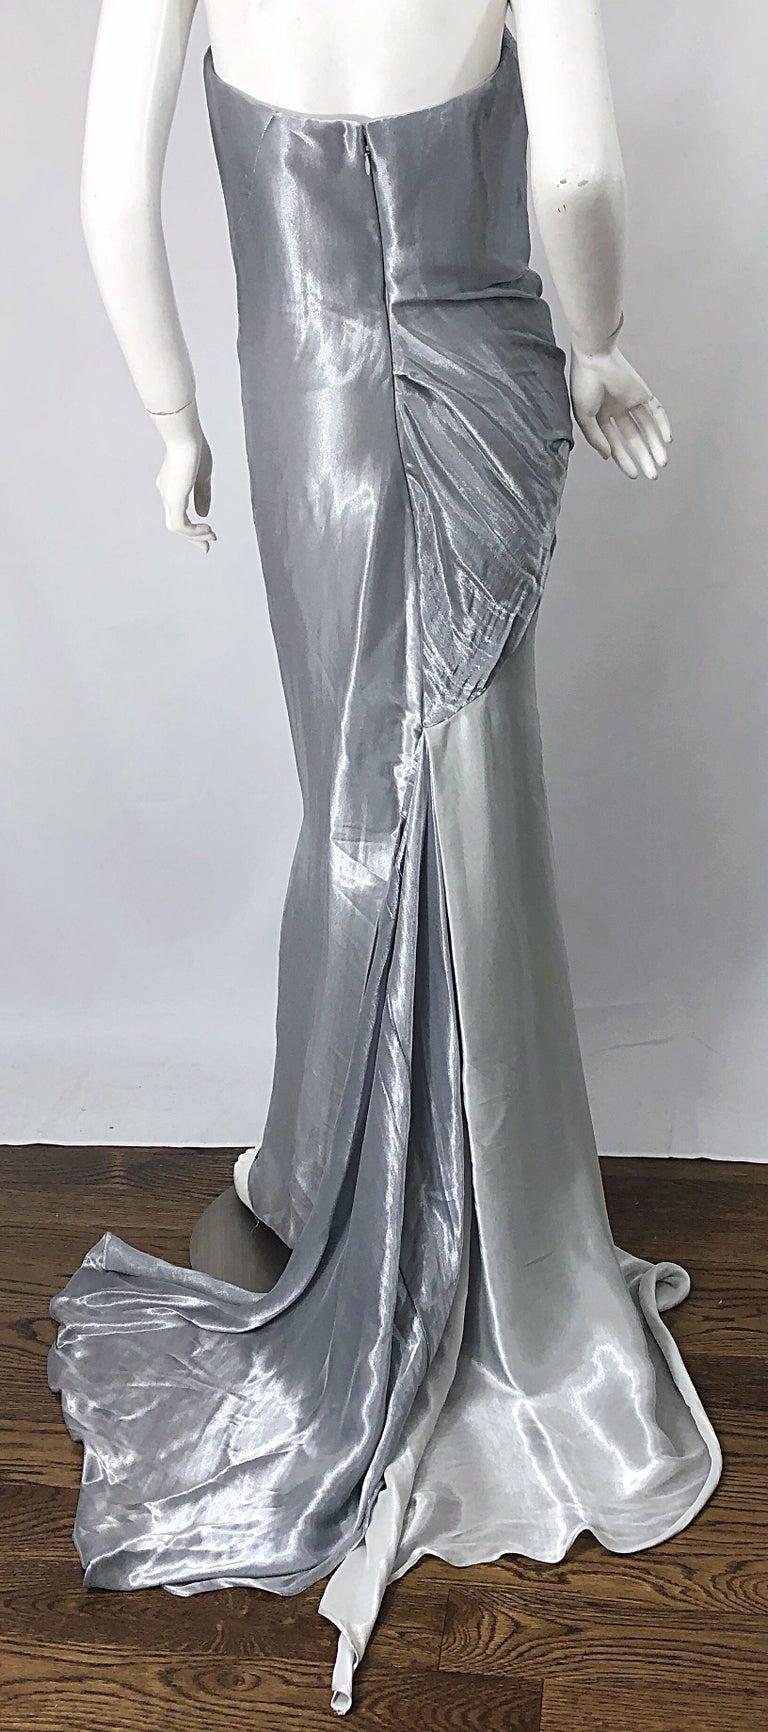 Donna Karan 1990s Size 4 Silver Grecian Metallic Strapless Vintage Silk 90s Gown For Sale 7